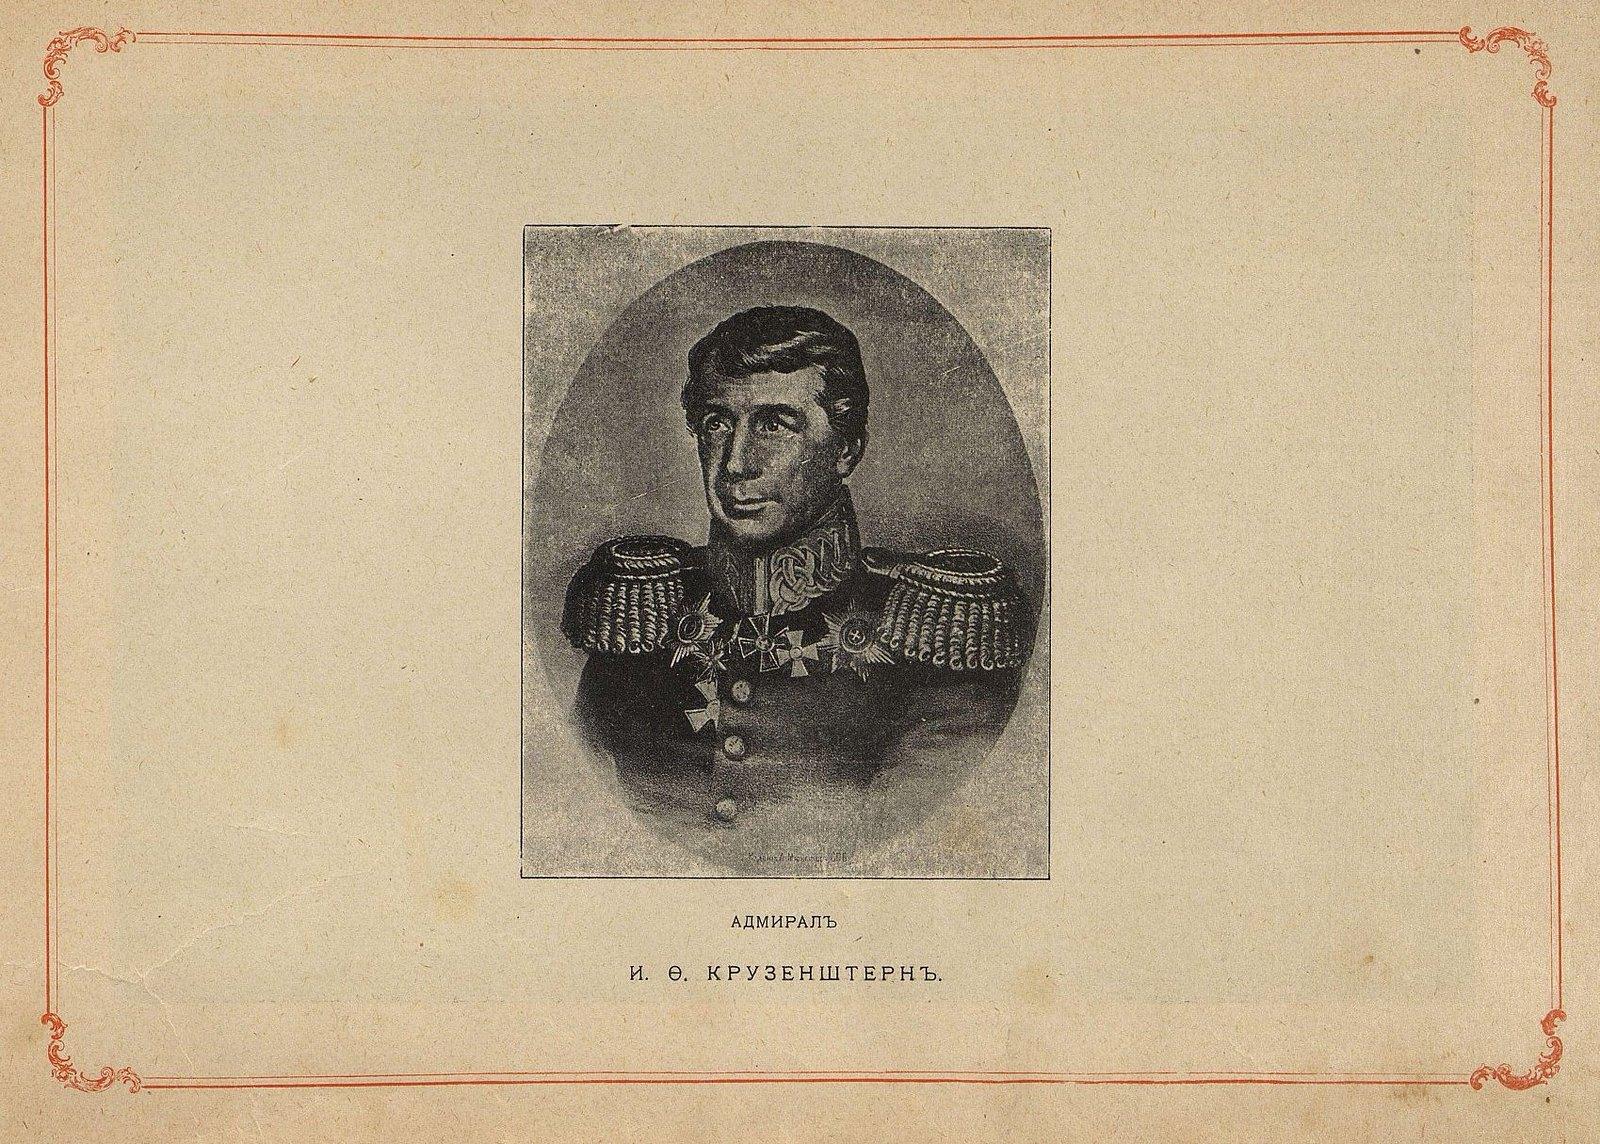 Портрет адмирала И.Ф. Крузенштерна